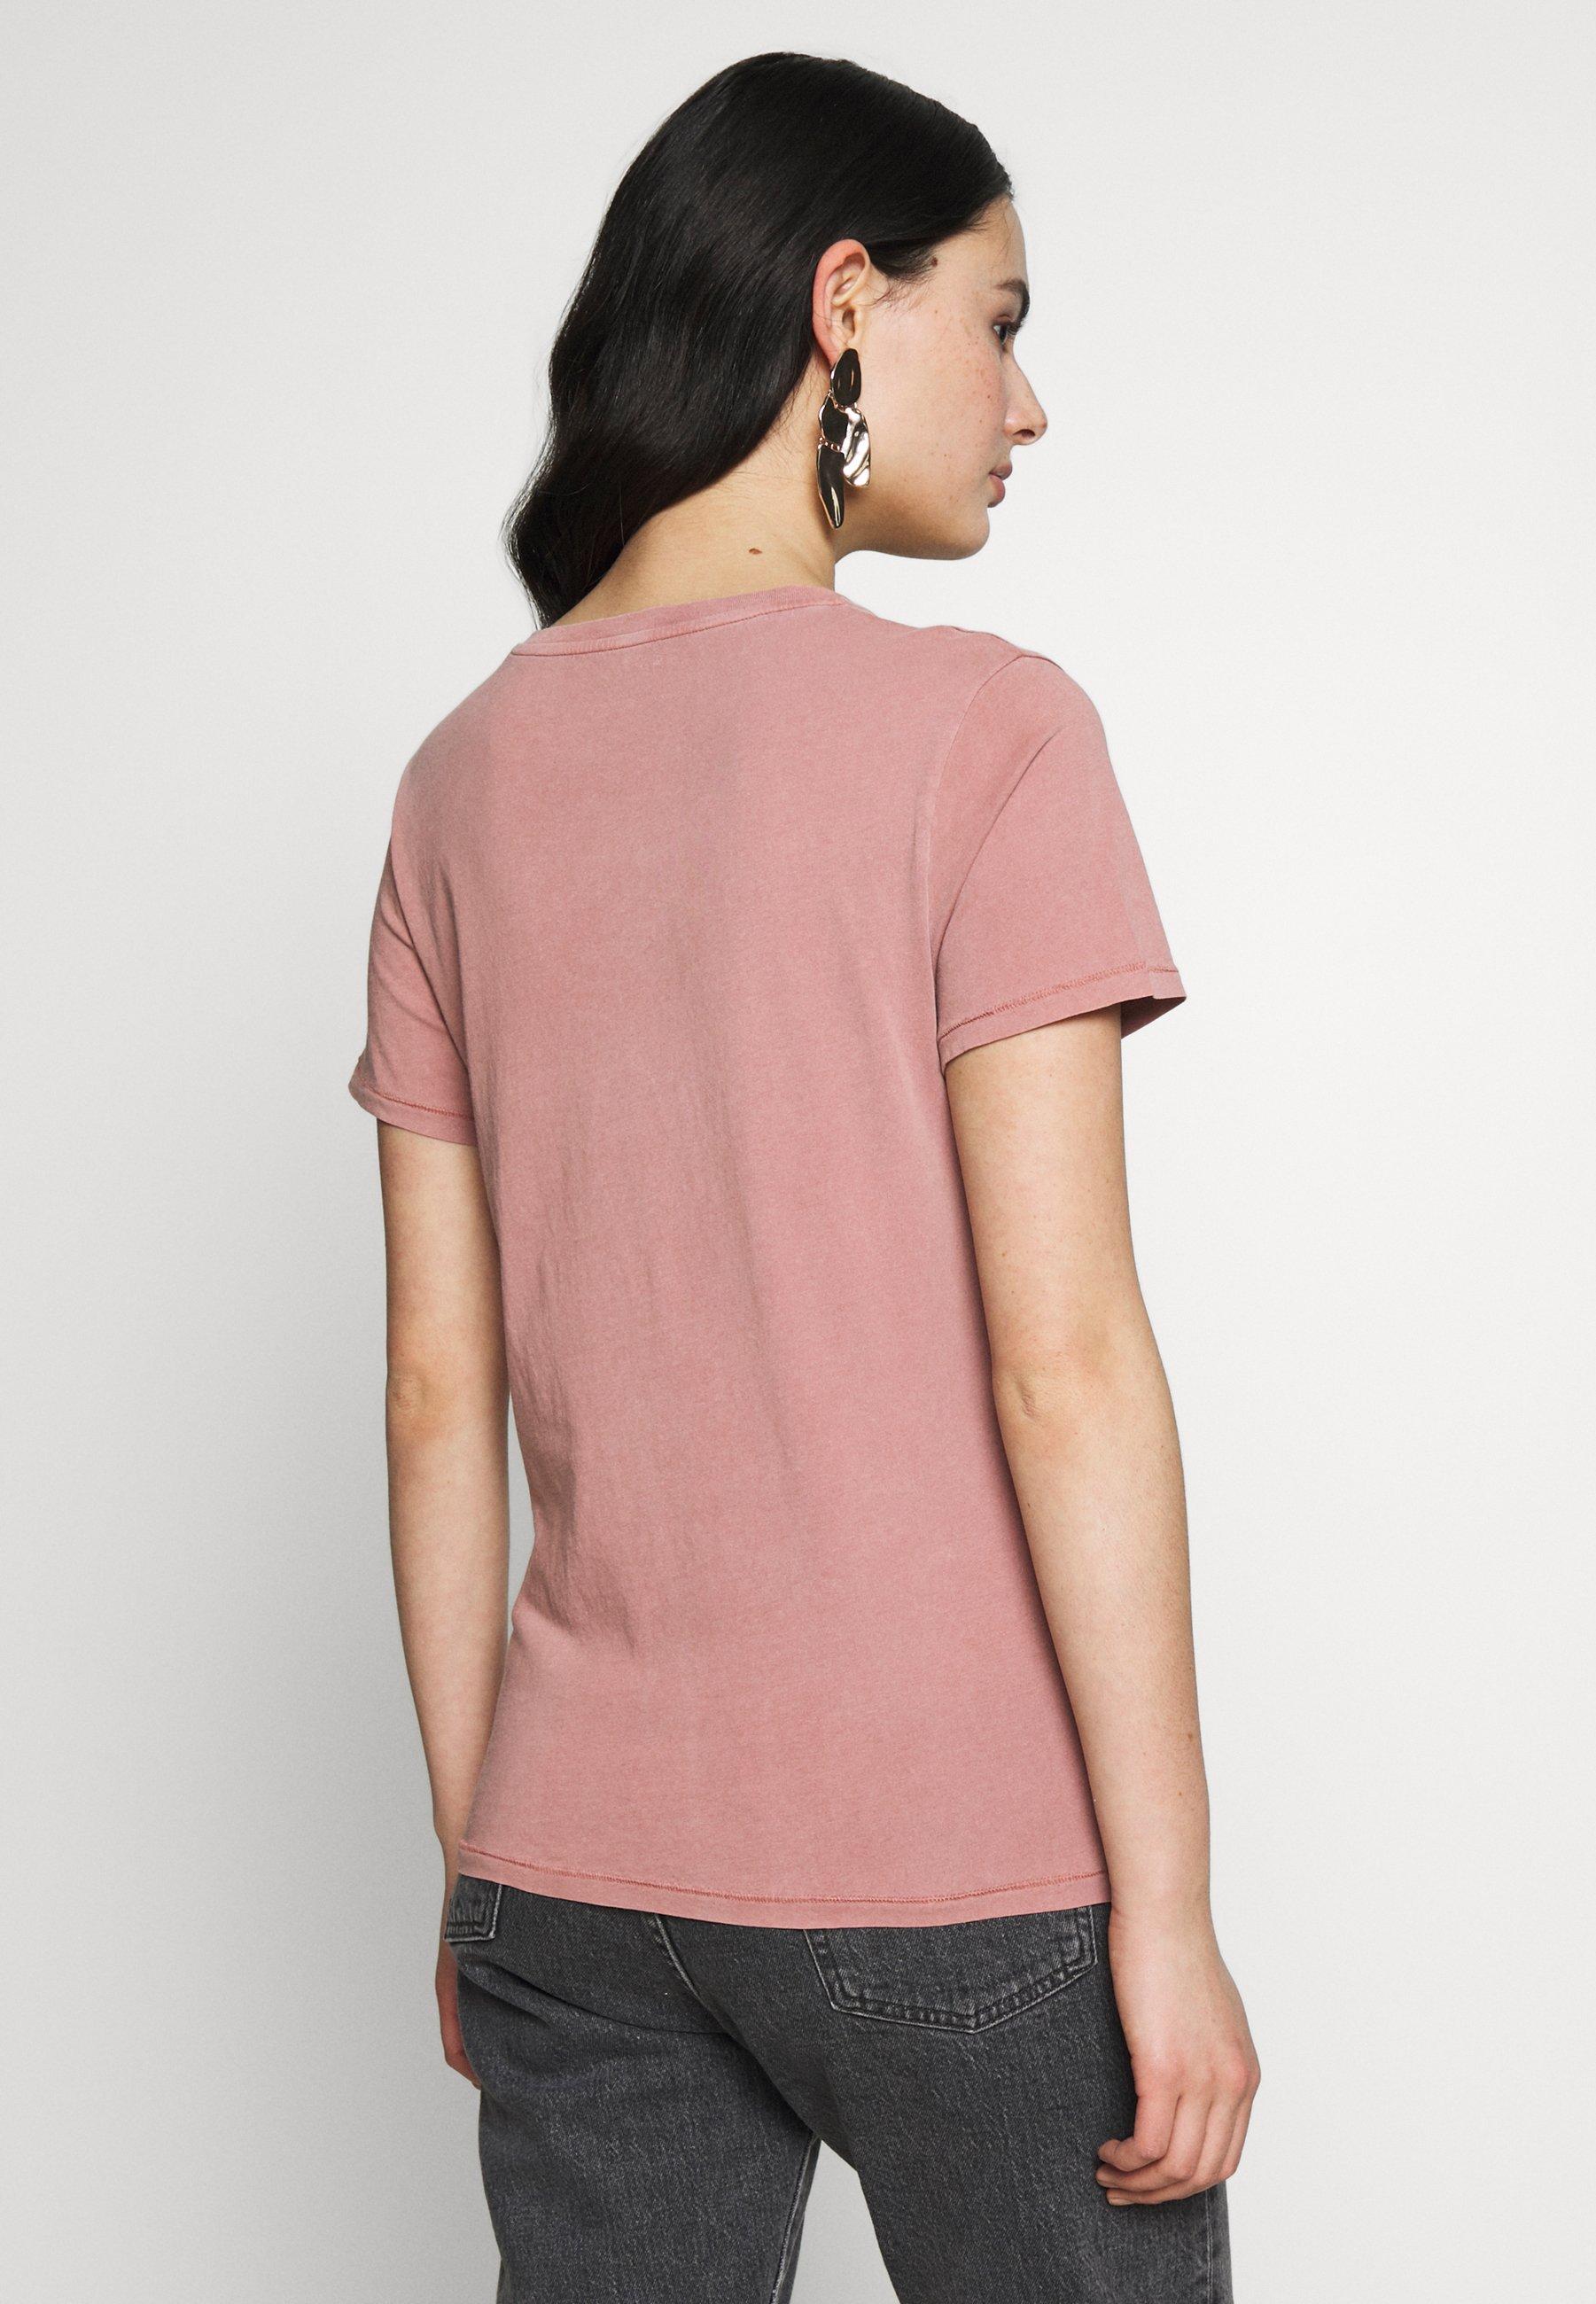 American Vintage Vegiflower - T-shirts Basic Pamplemousse